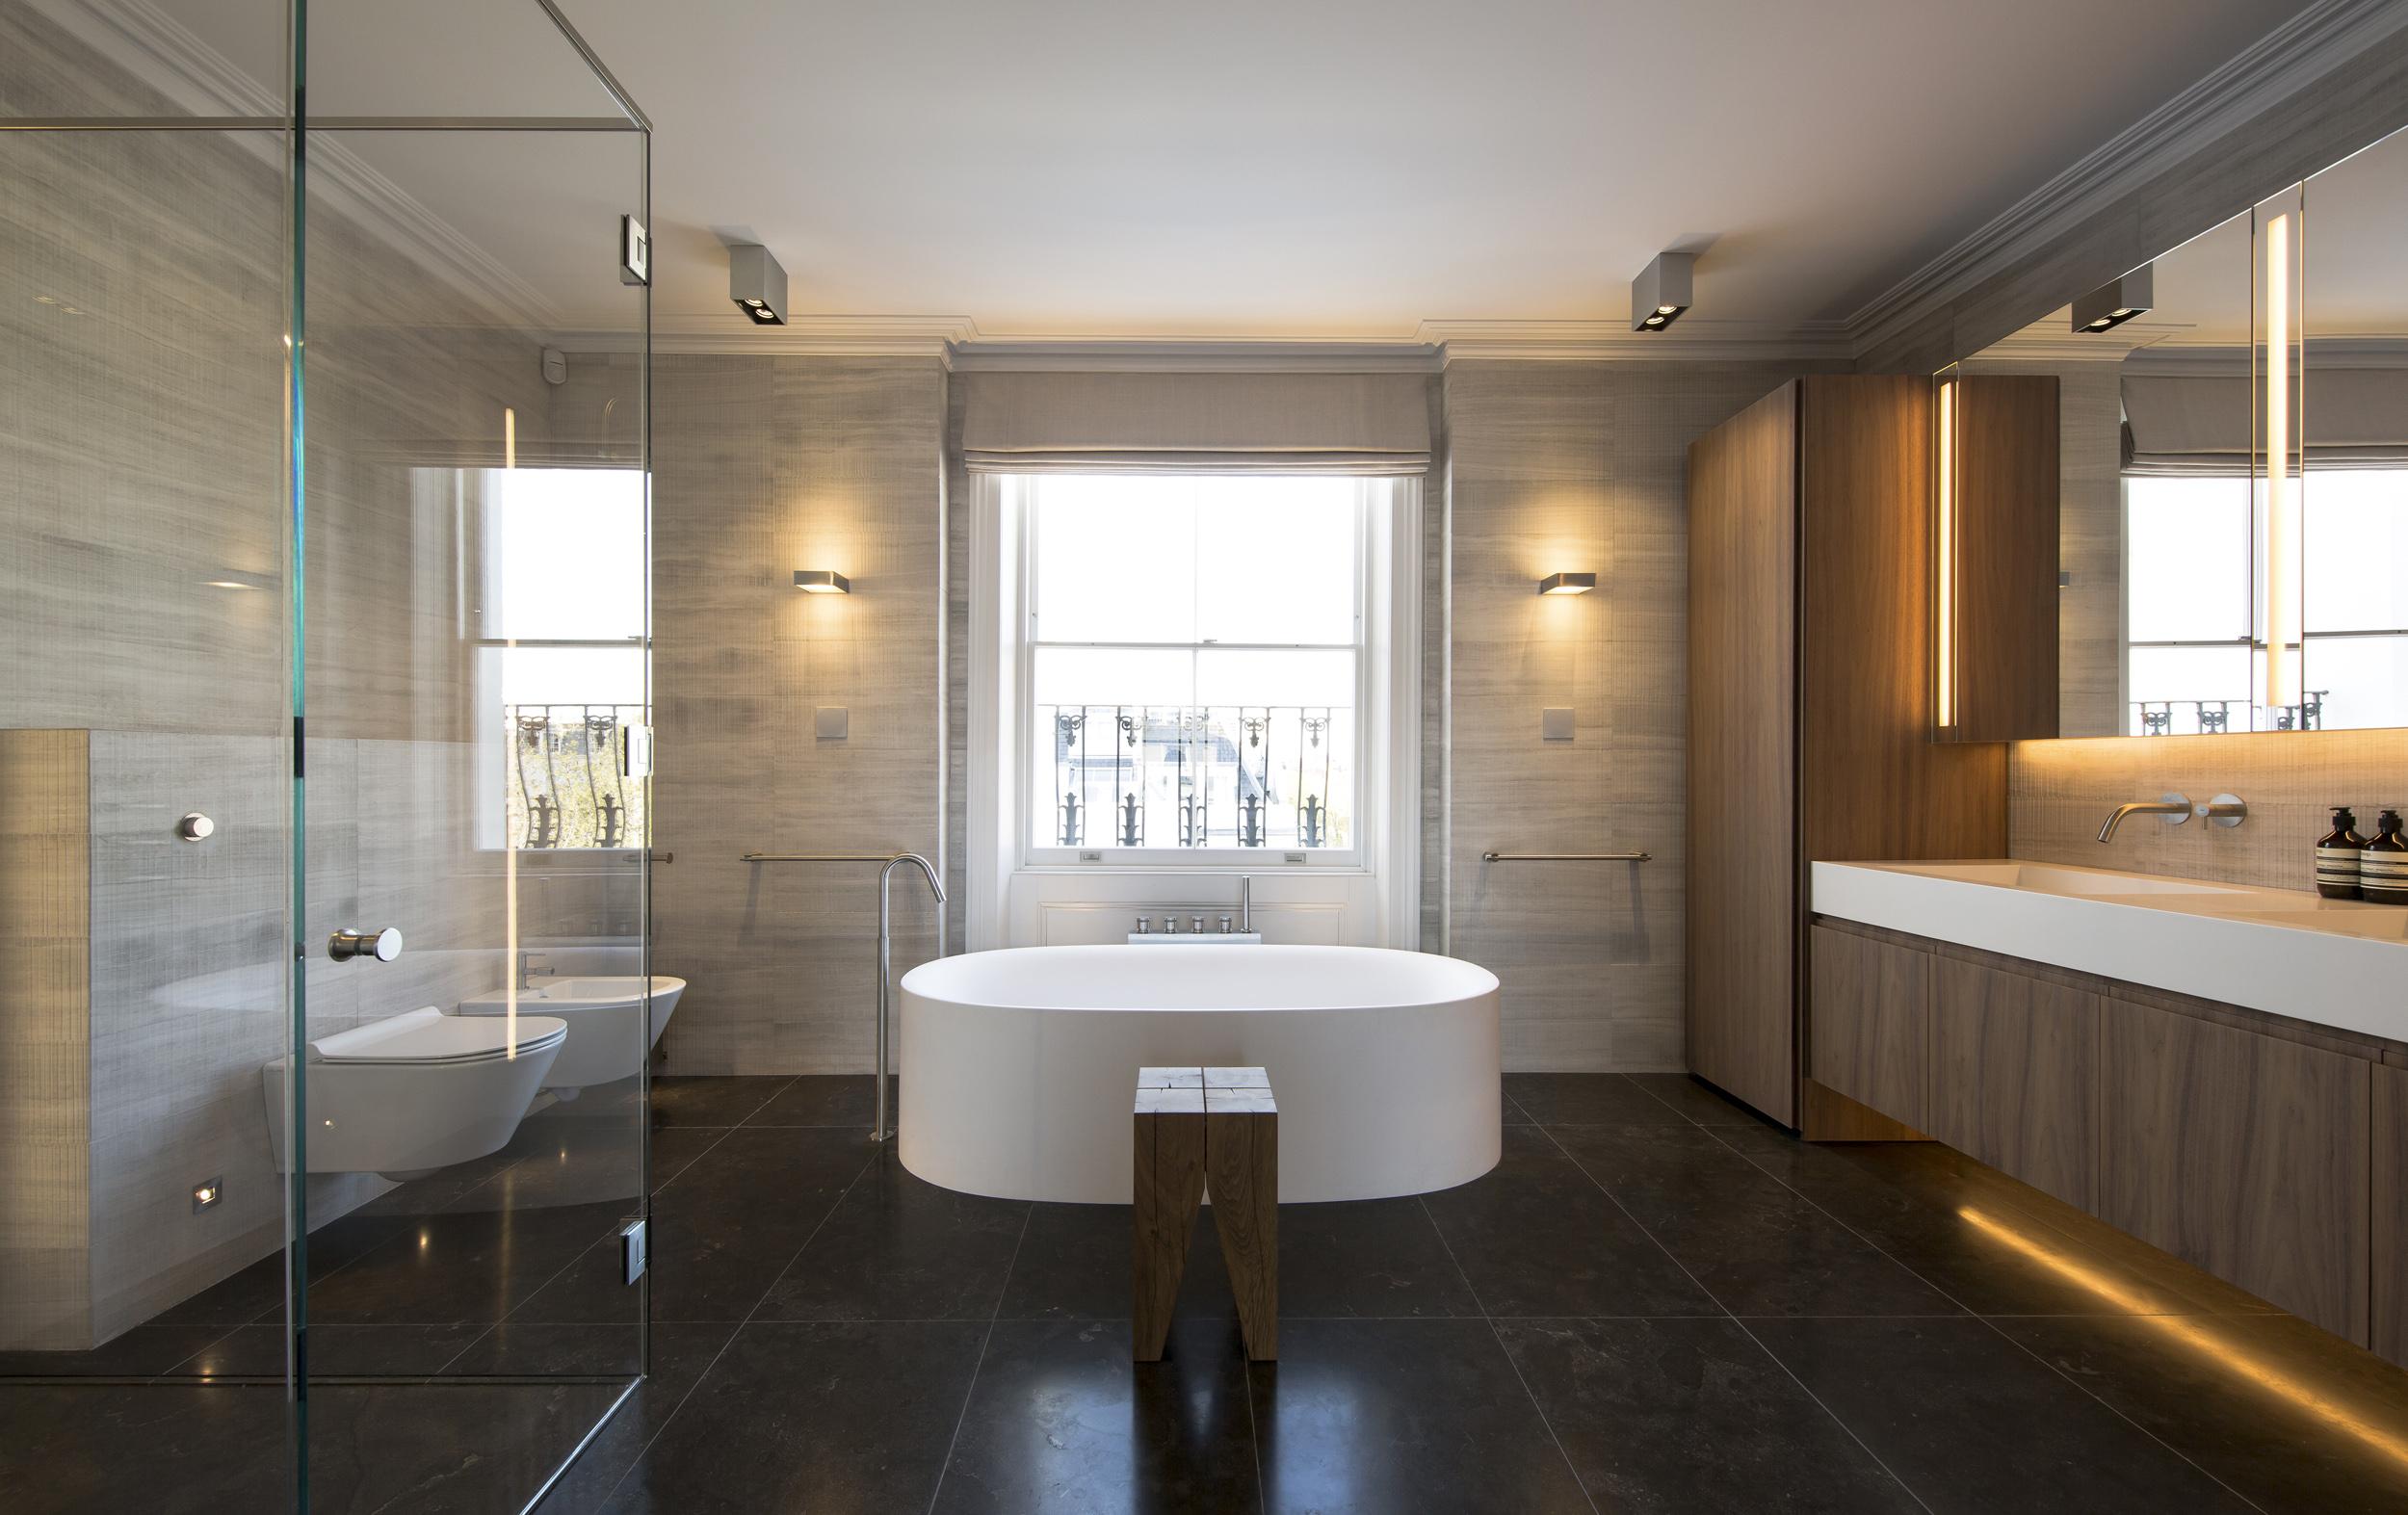 06_Second_Bathroom4_Main01-0674.jpg